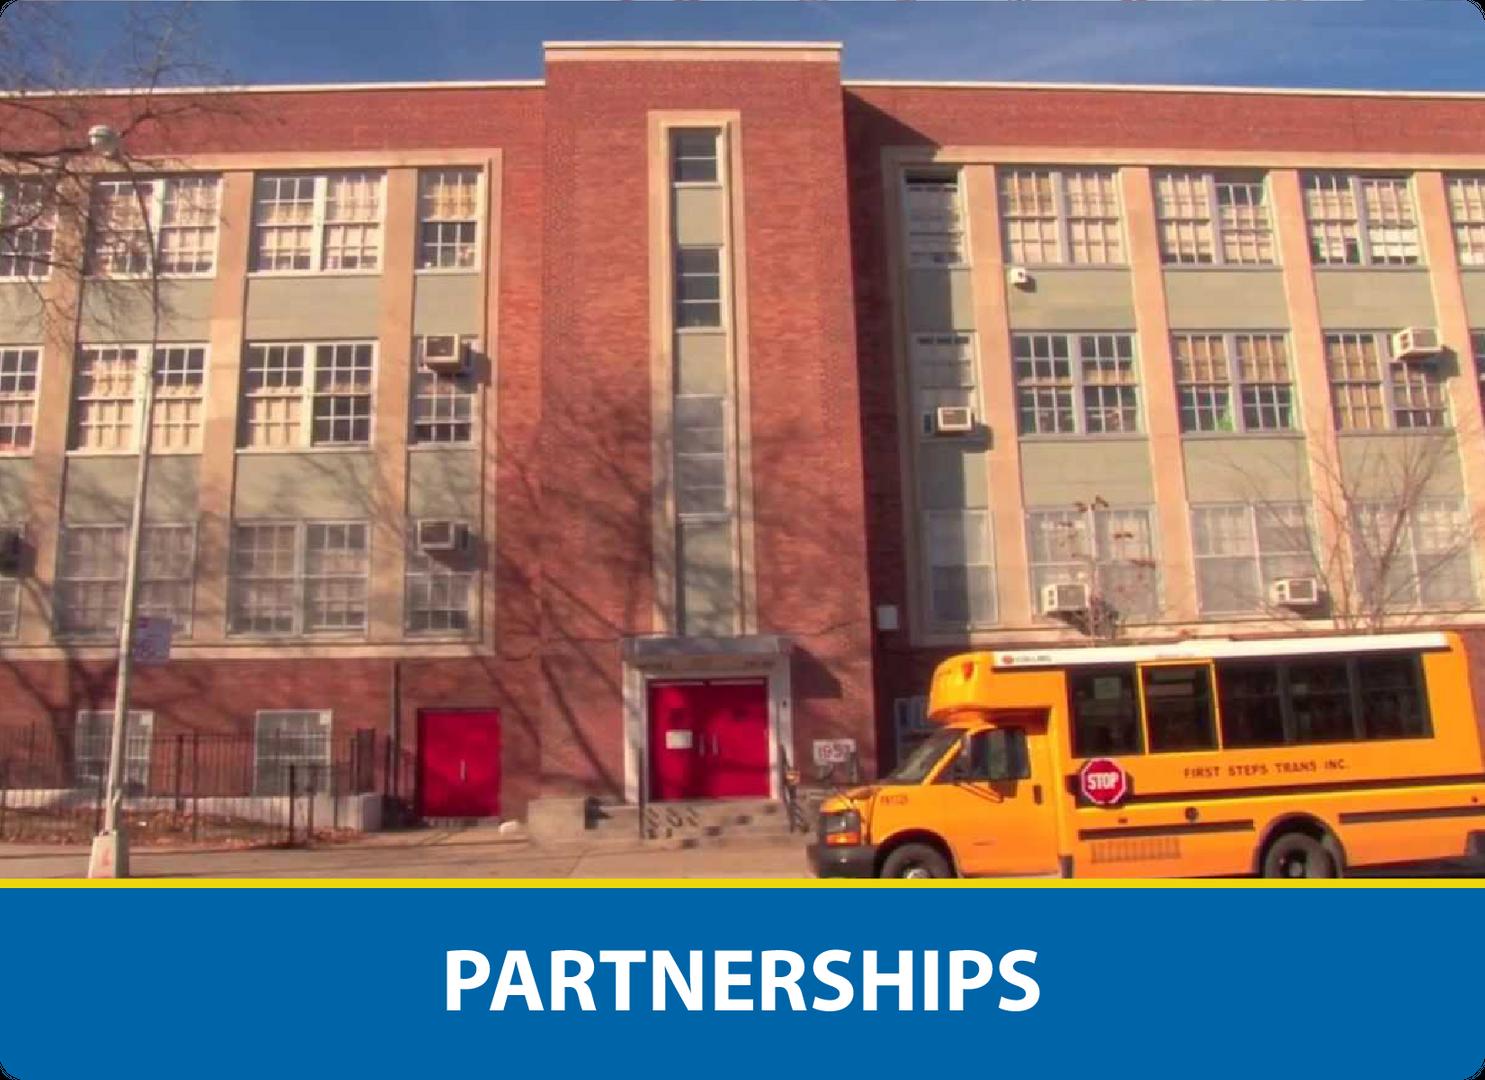 Partnerships: The Bronxwood School facade